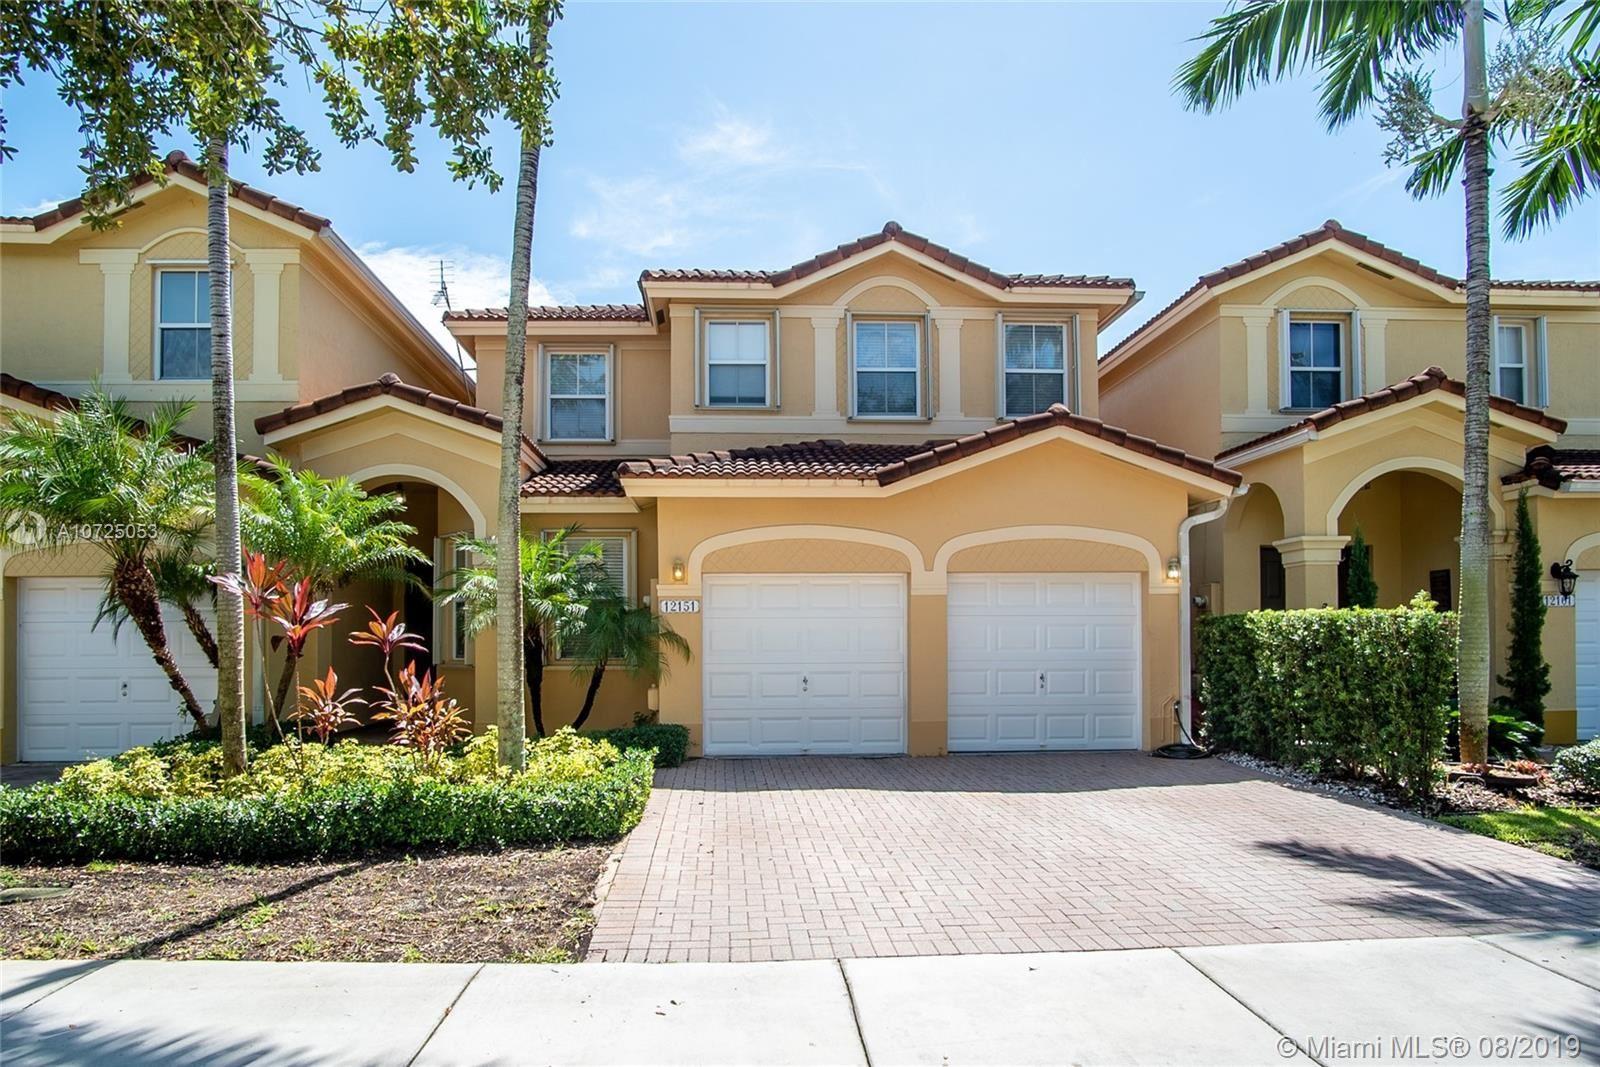 12151 SW 123rd Pl, Miami, FL 33186 - #: A10725053